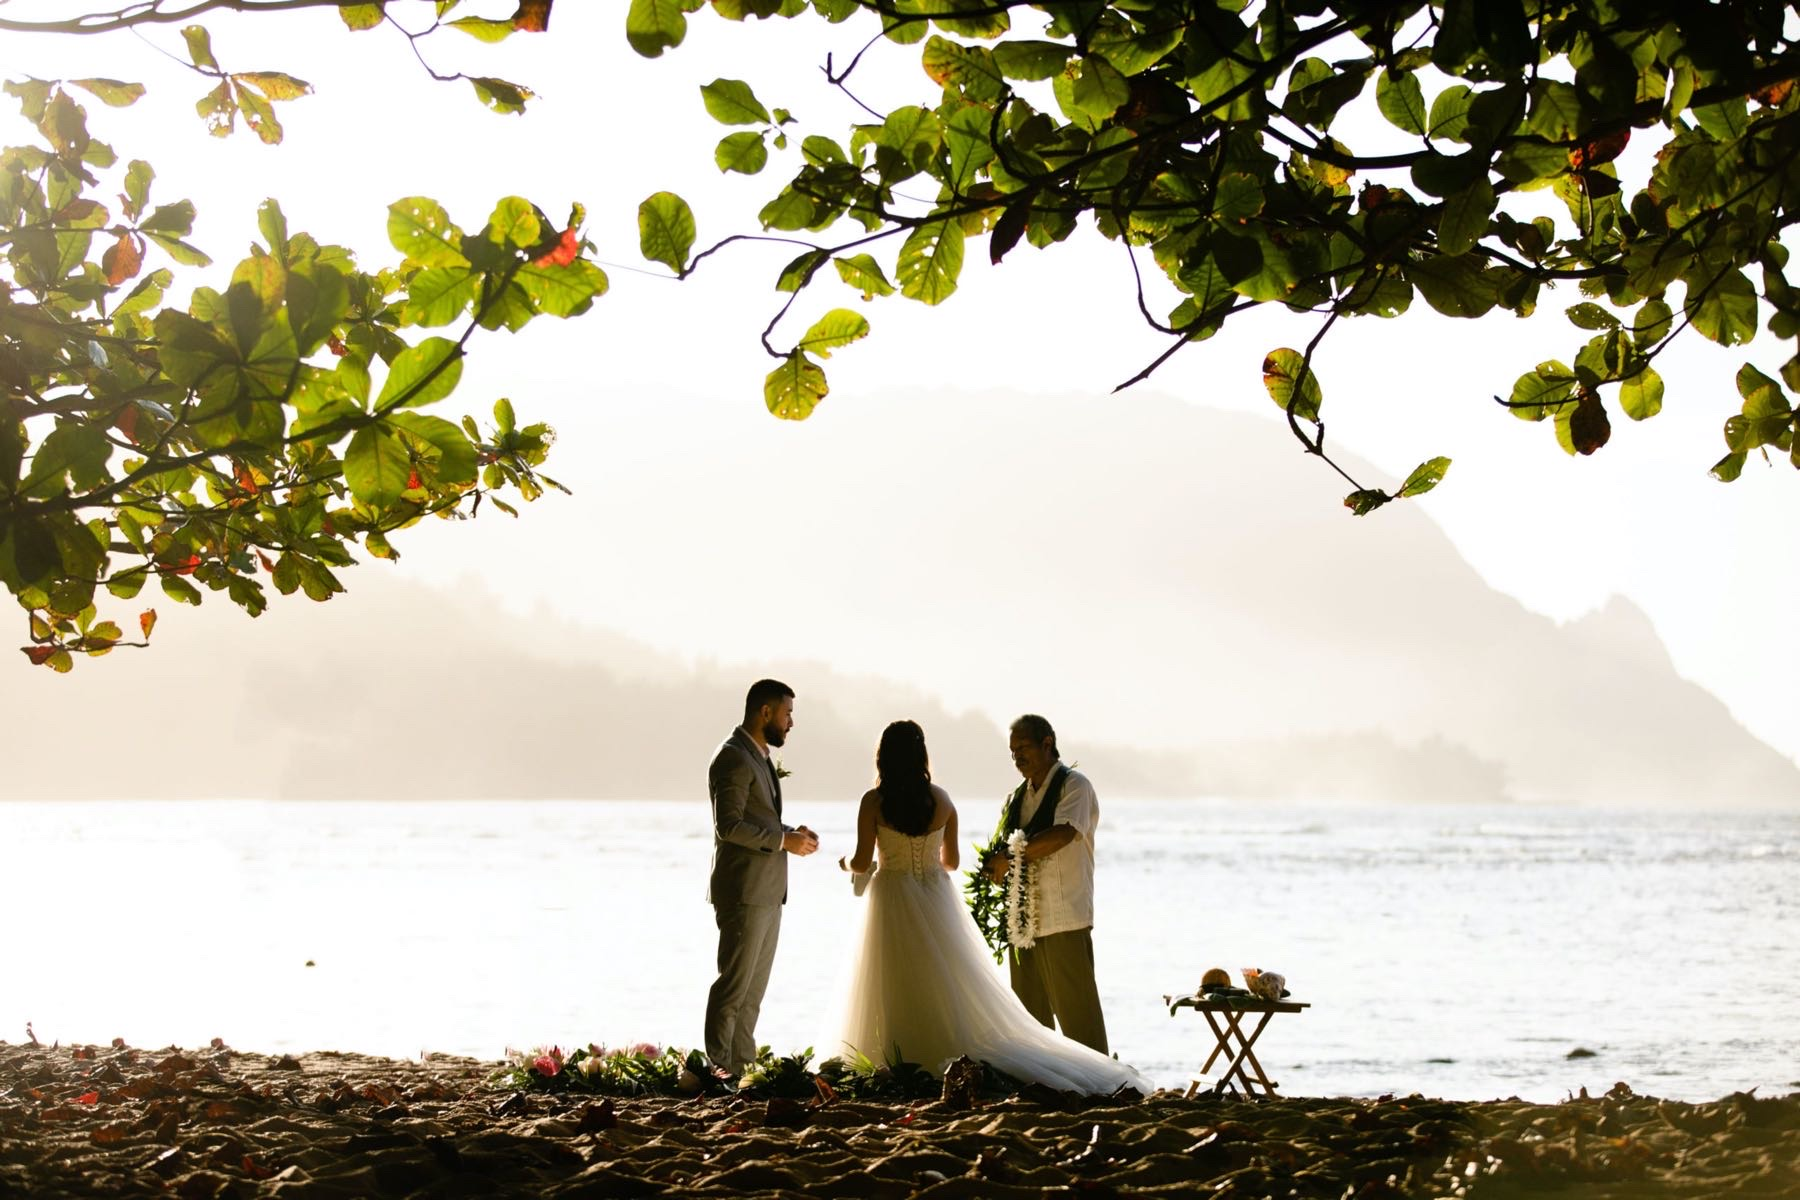 Paige & Jose getting married on the beach in Kauai.